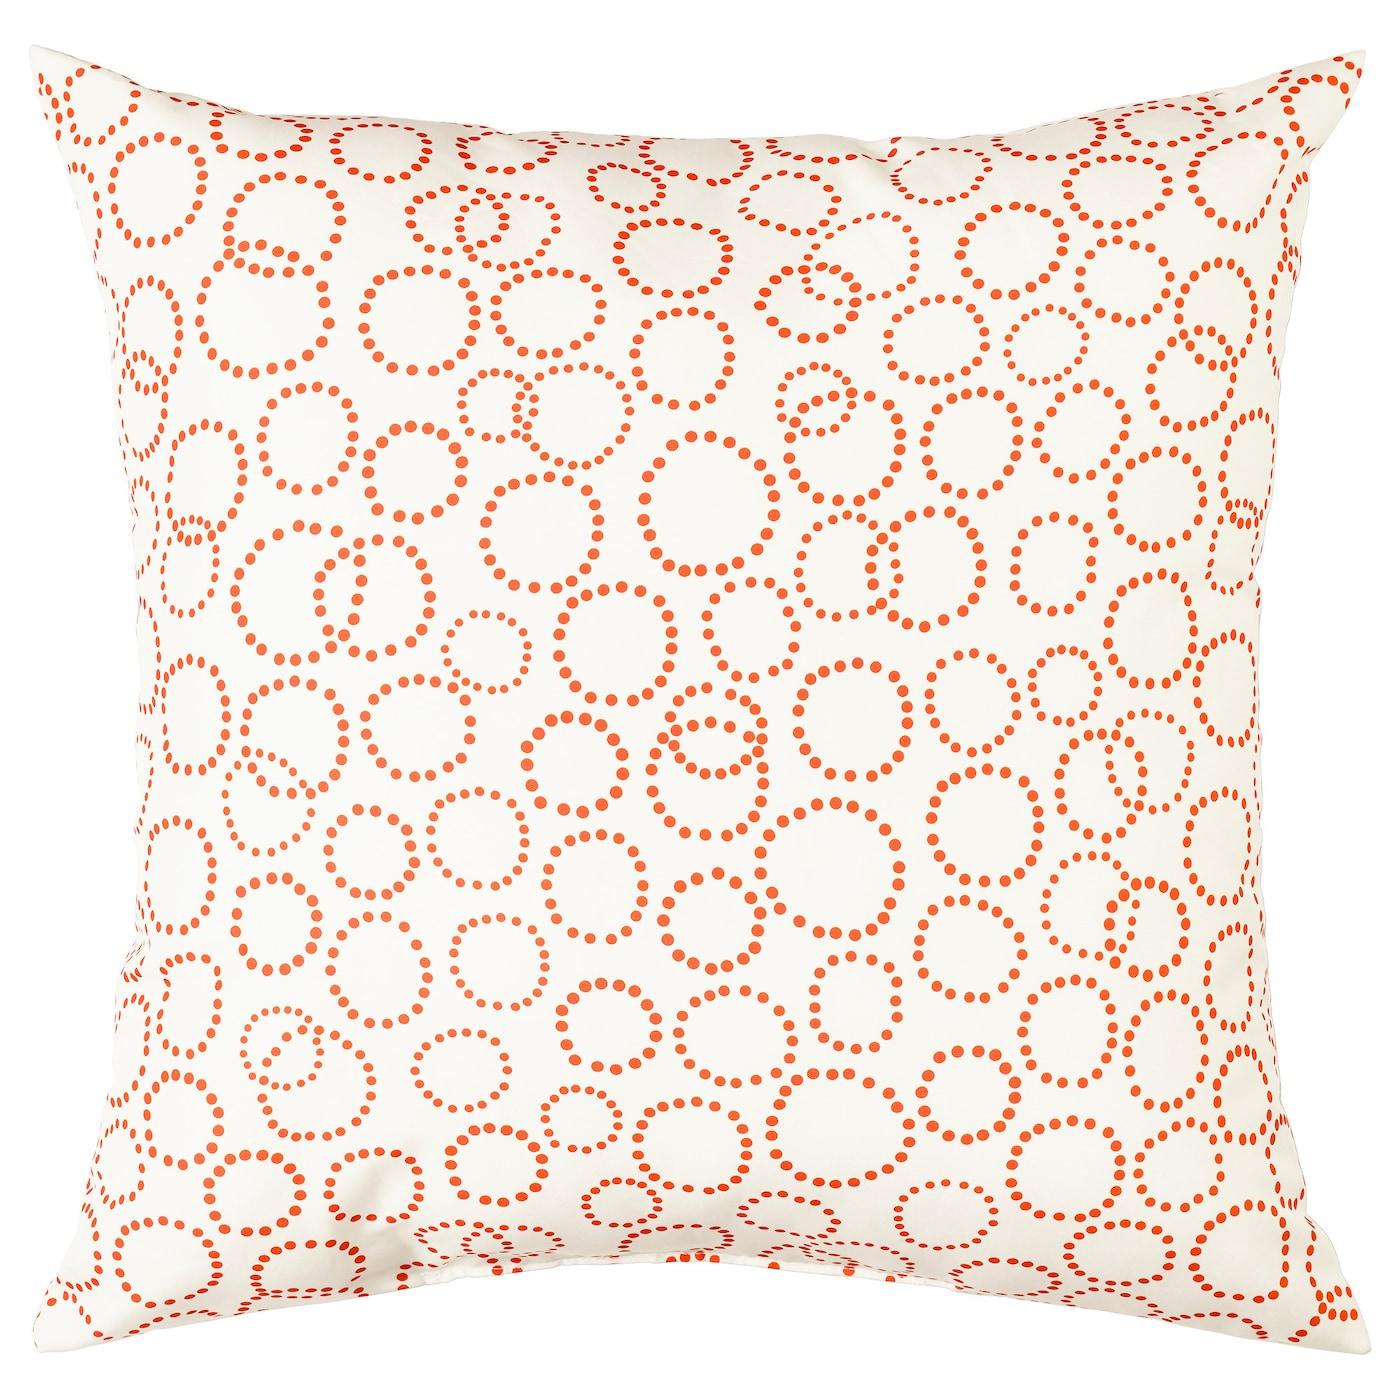 tr daster coussin blanc orange 40x40 cm ikea. Black Bedroom Furniture Sets. Home Design Ideas